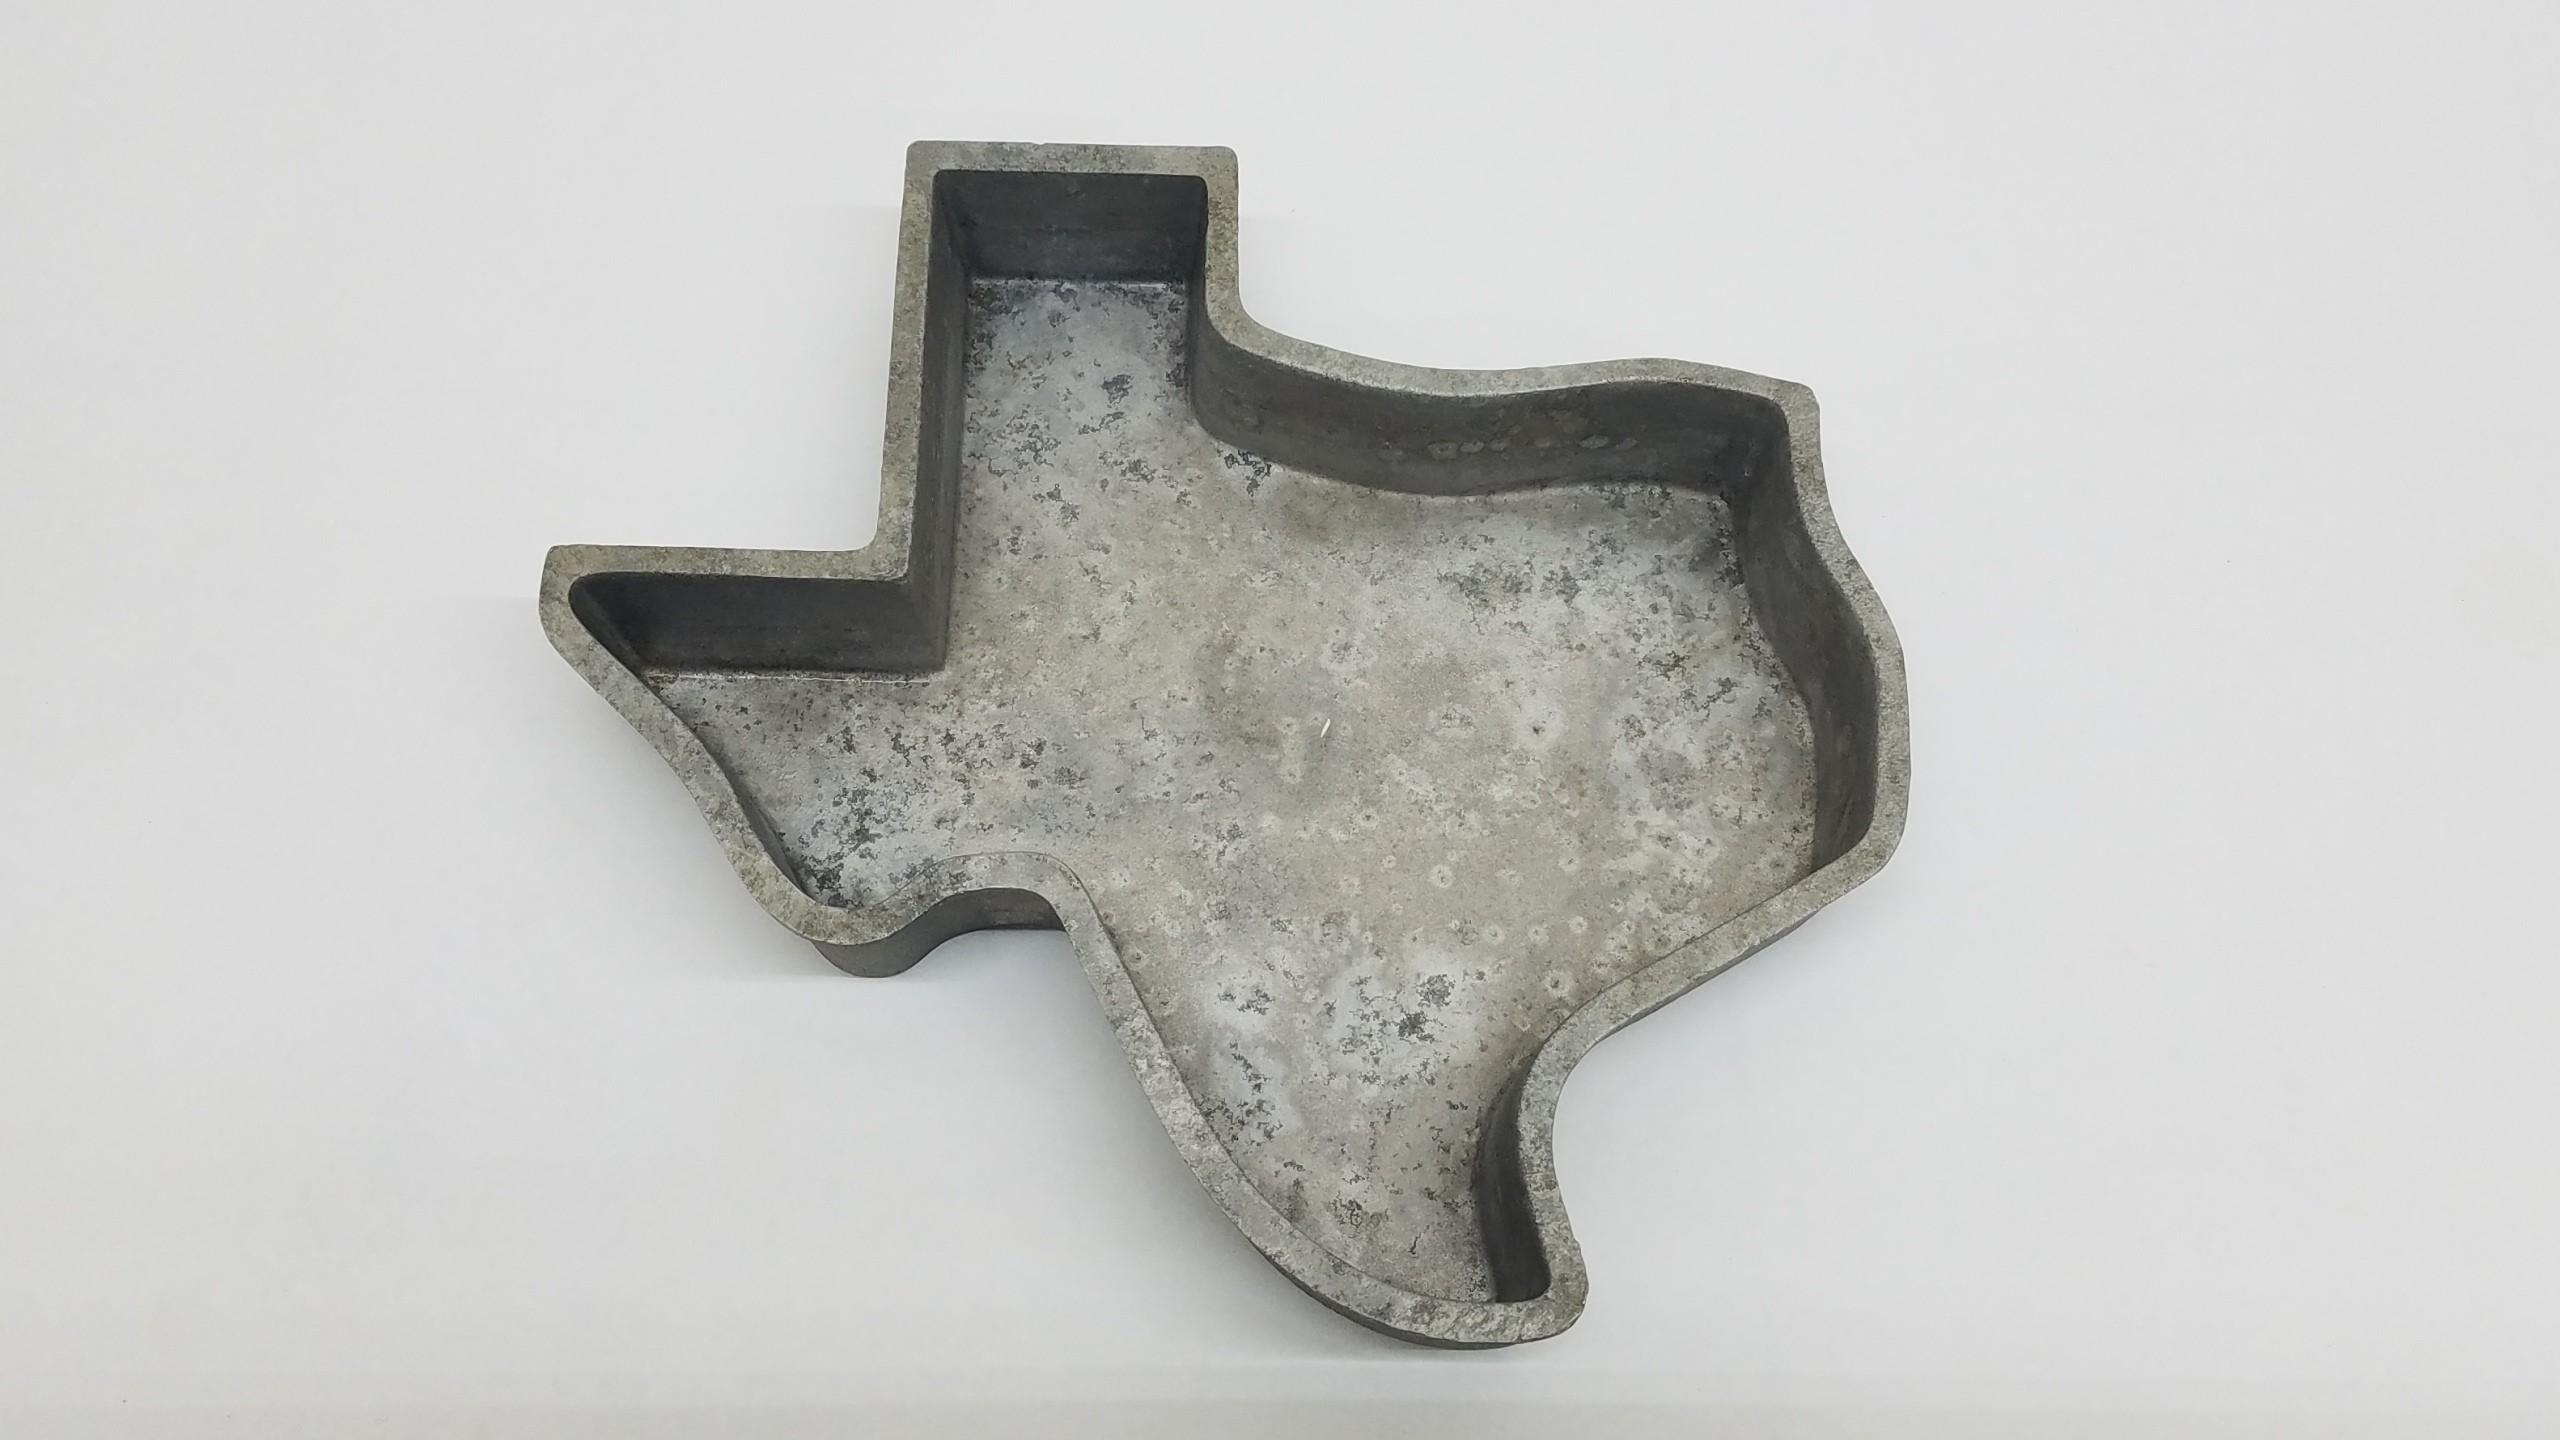 Vintage Texas Cake Bake Pan 1969 Heritage Garden Museum State Cast Aluminum